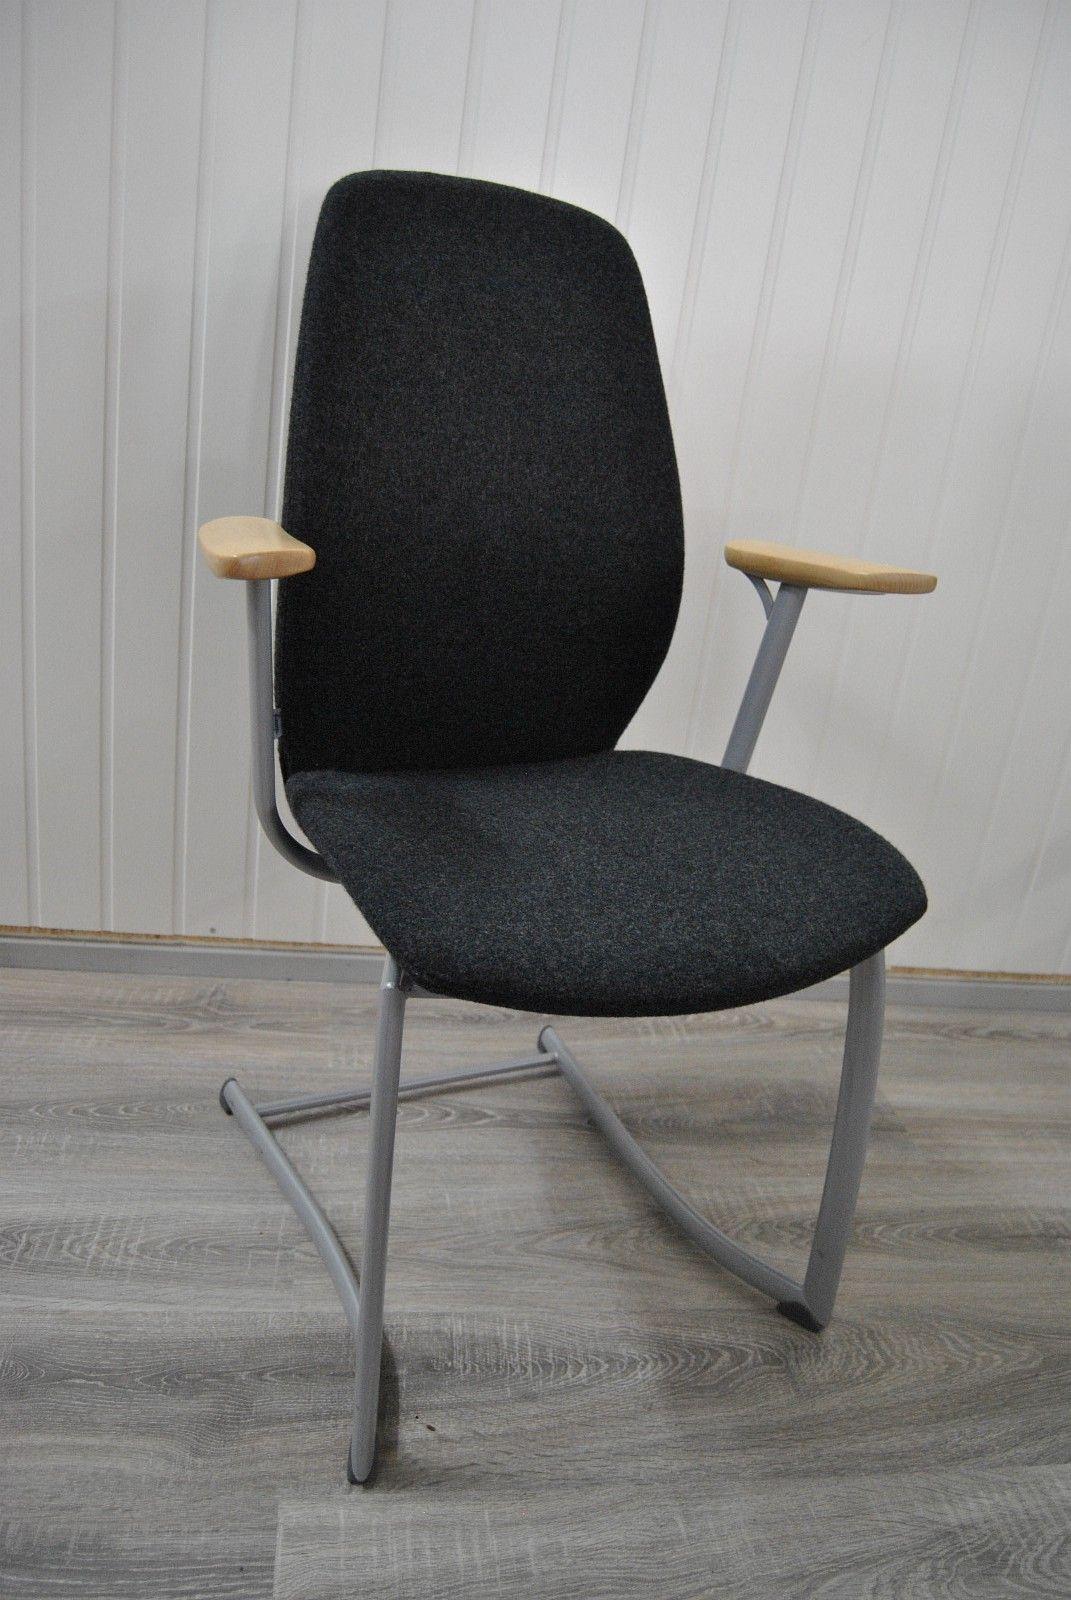 2 stk. Pent brukt Kinnarps Plus 377 konferansestoler | FINN.no